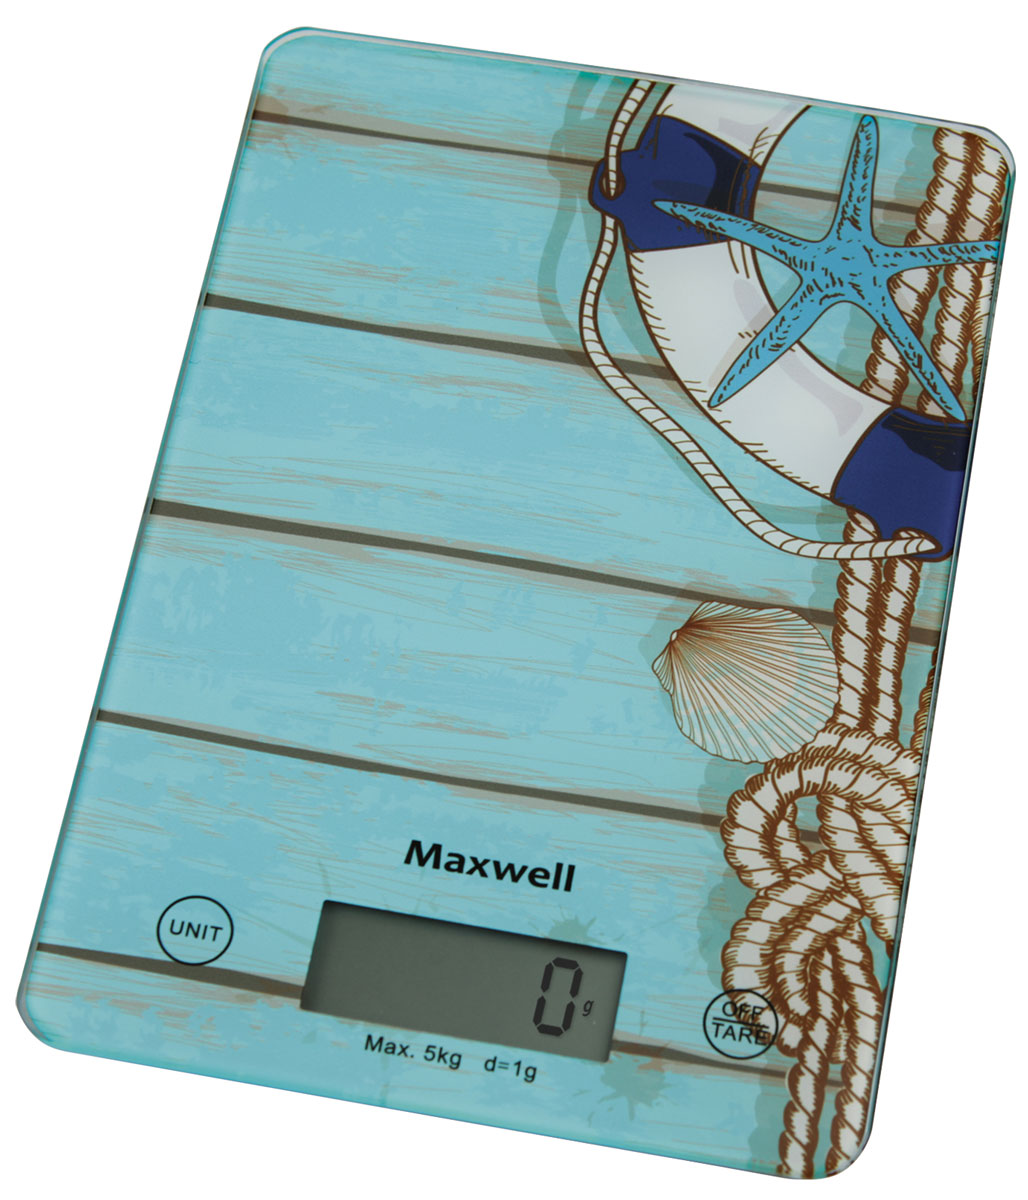 Кухонные весы Maxwell MW-1473(B) весы кухонные maxwell mw 1476 w белый рисунок